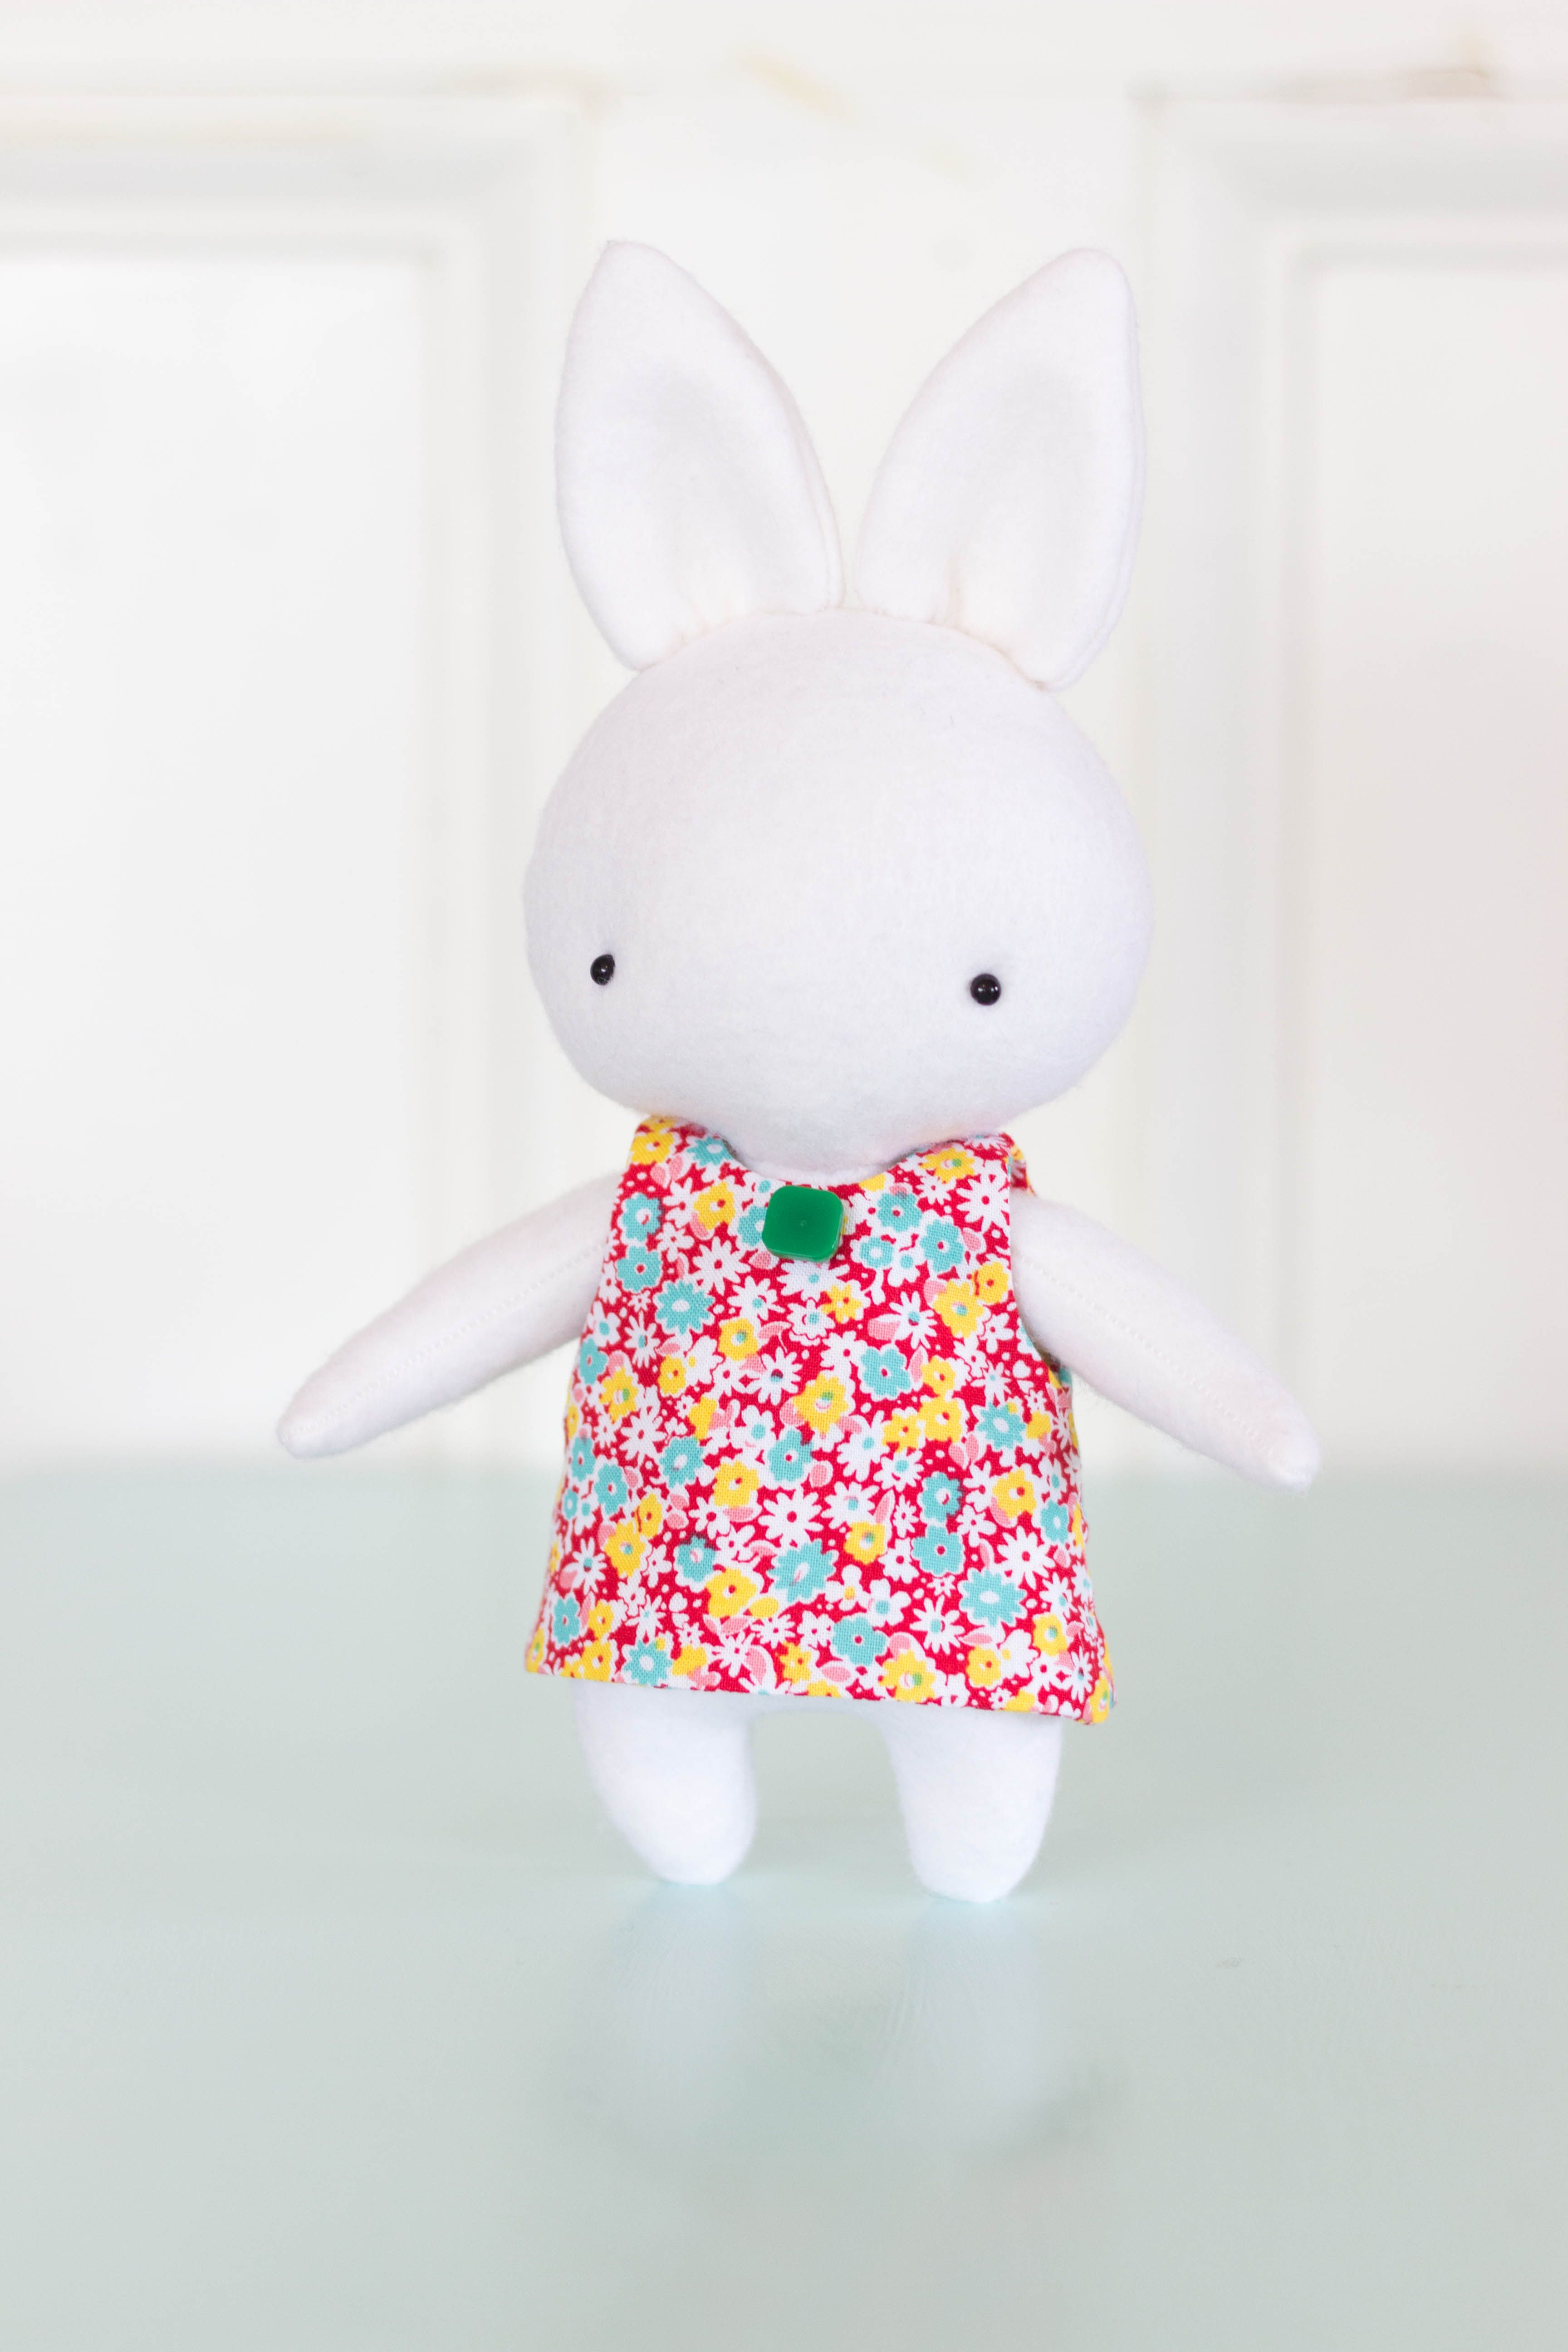 Sukie A tribute to Miffy felt rabbit with fabric dress